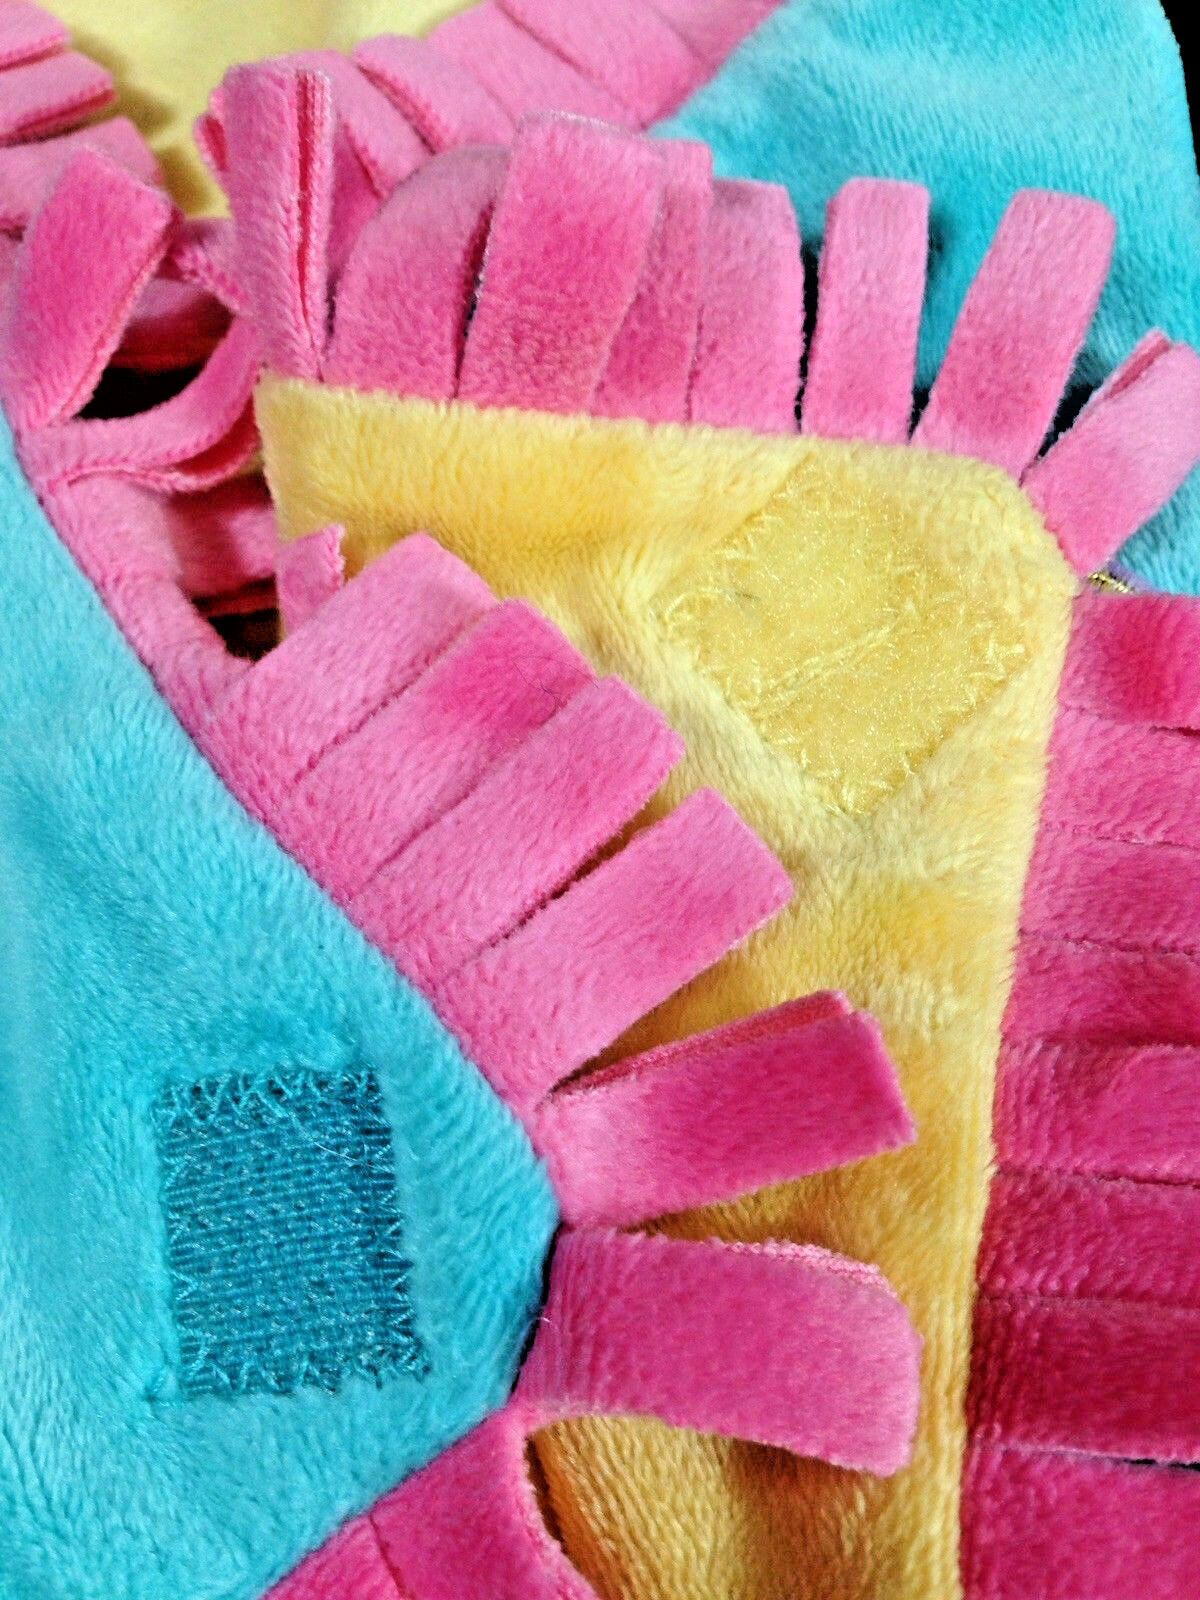 Disneyland Disney Babies Blanket for Dumbo Plush Blue Pink Yellow Fringe Wrap image 5